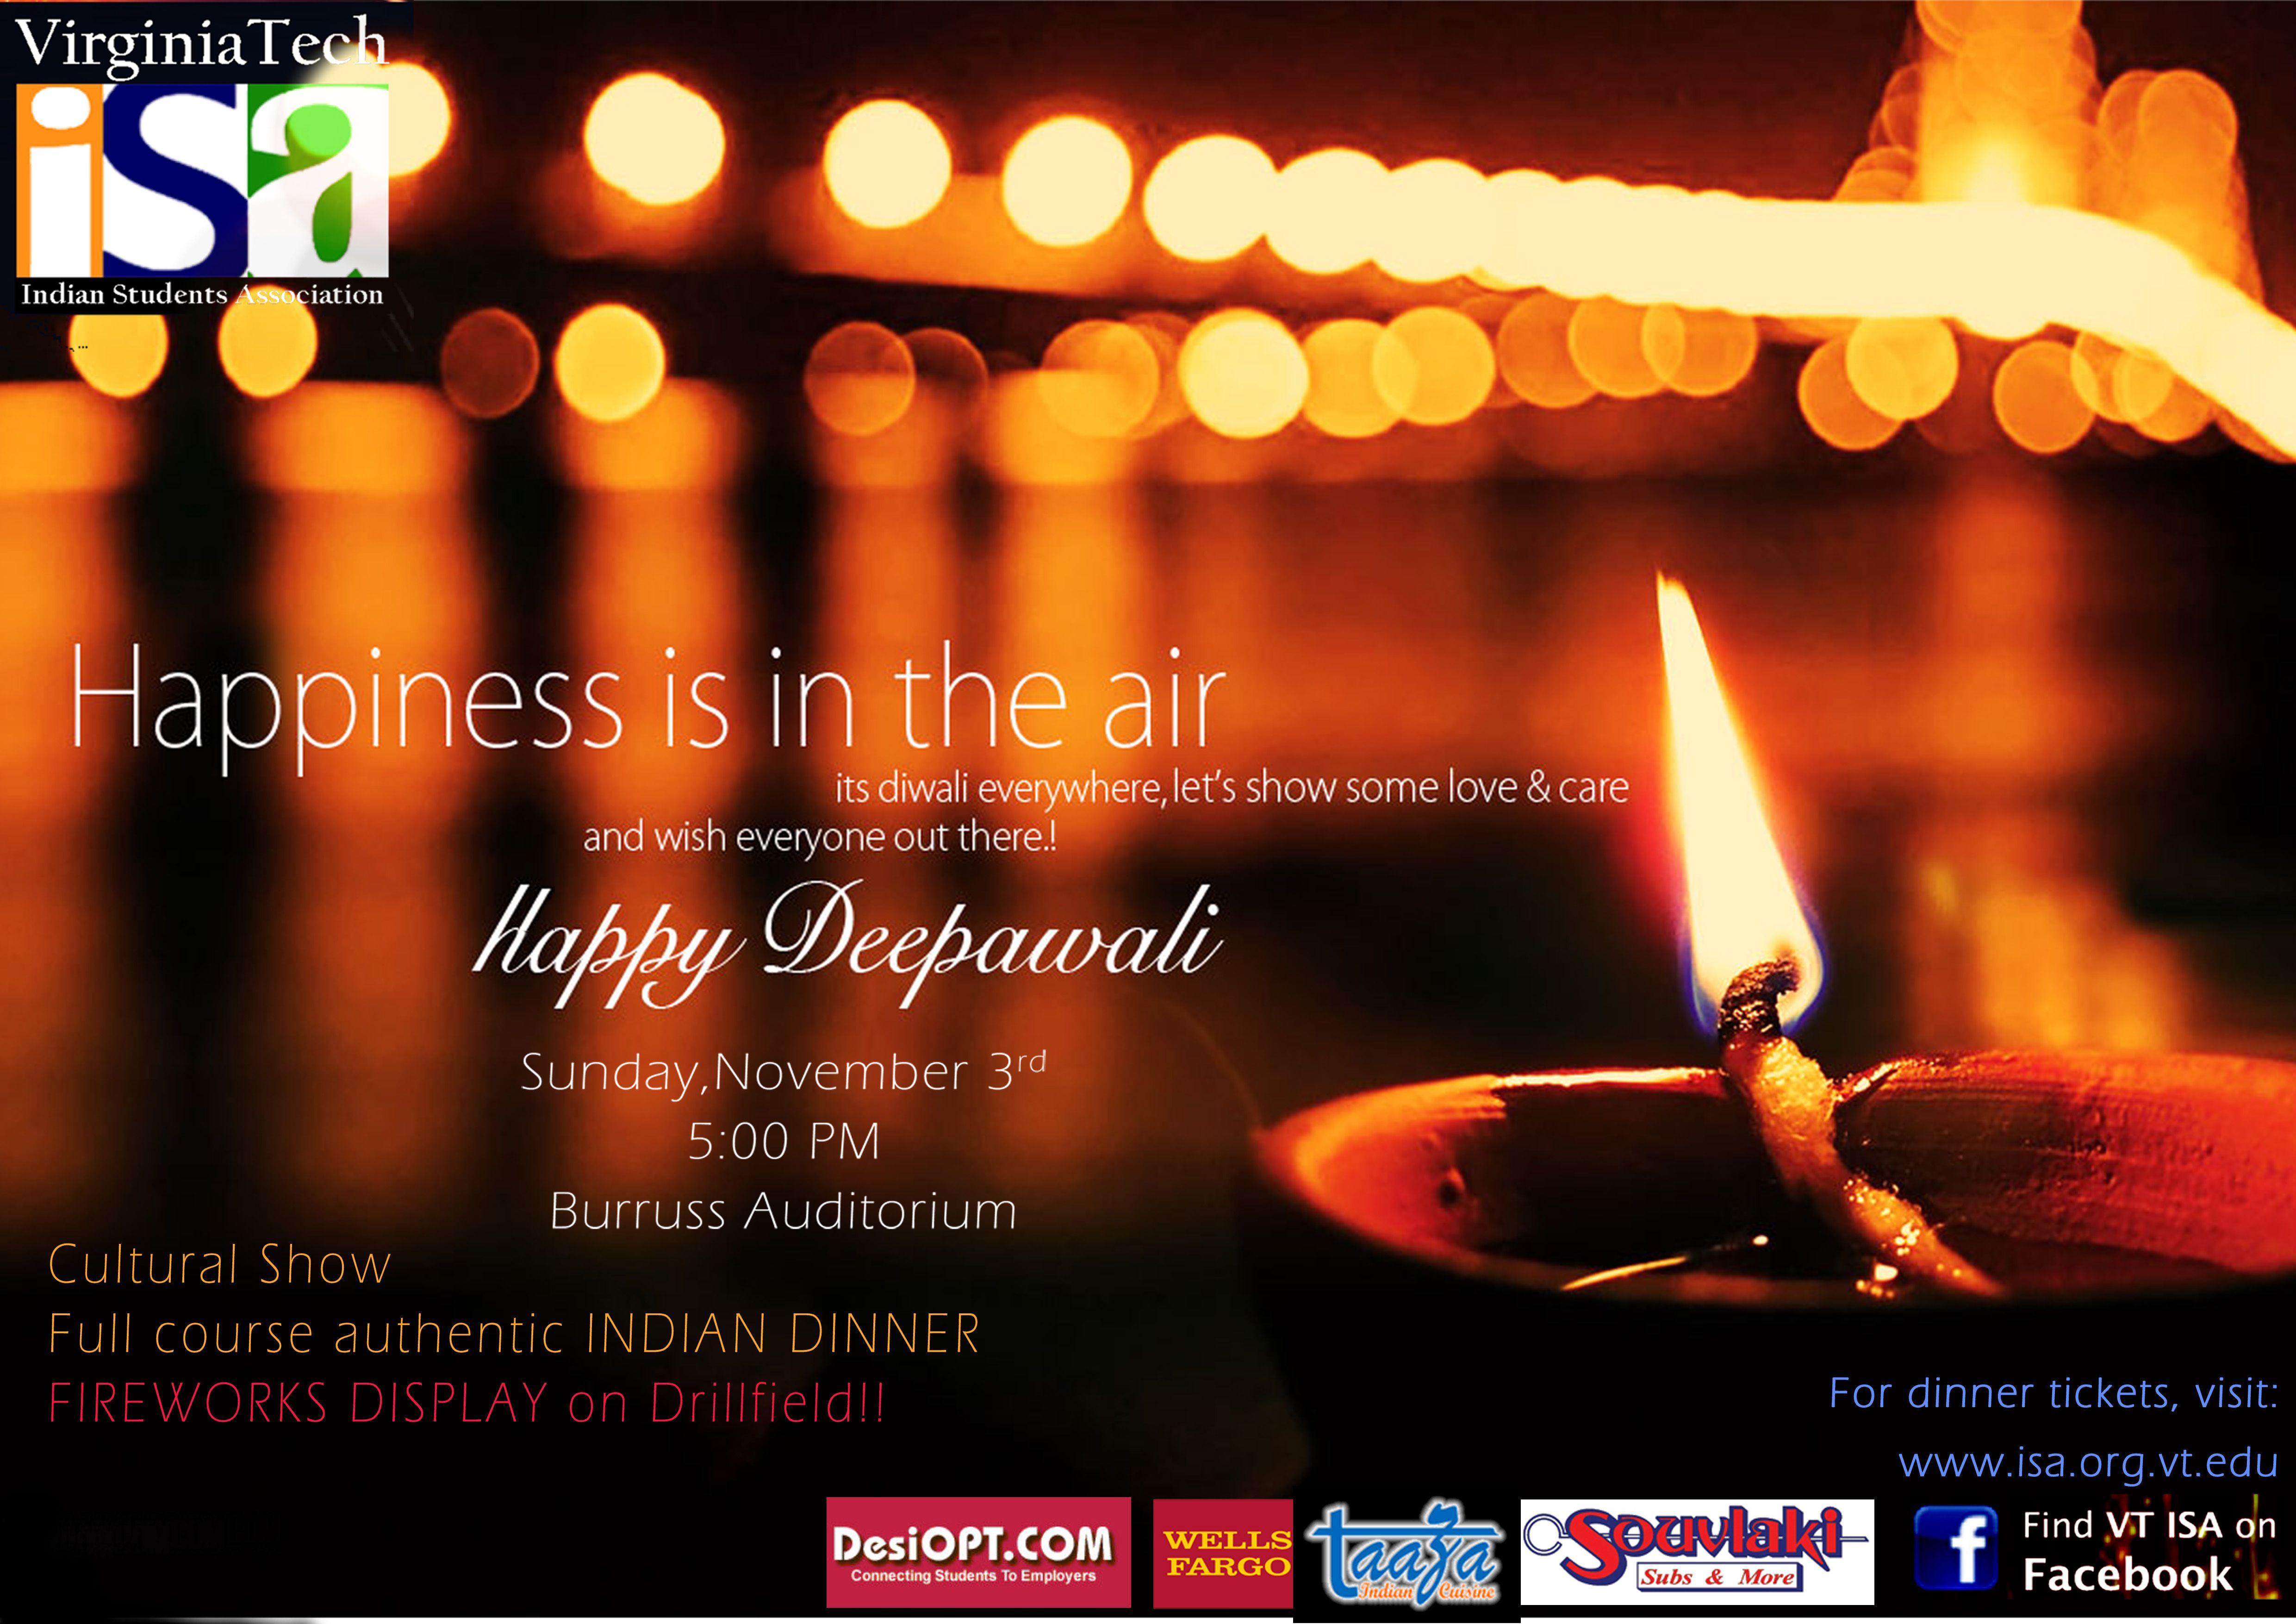 Diwali 2013 Celebration on Sunday, November 3rd in Burruss